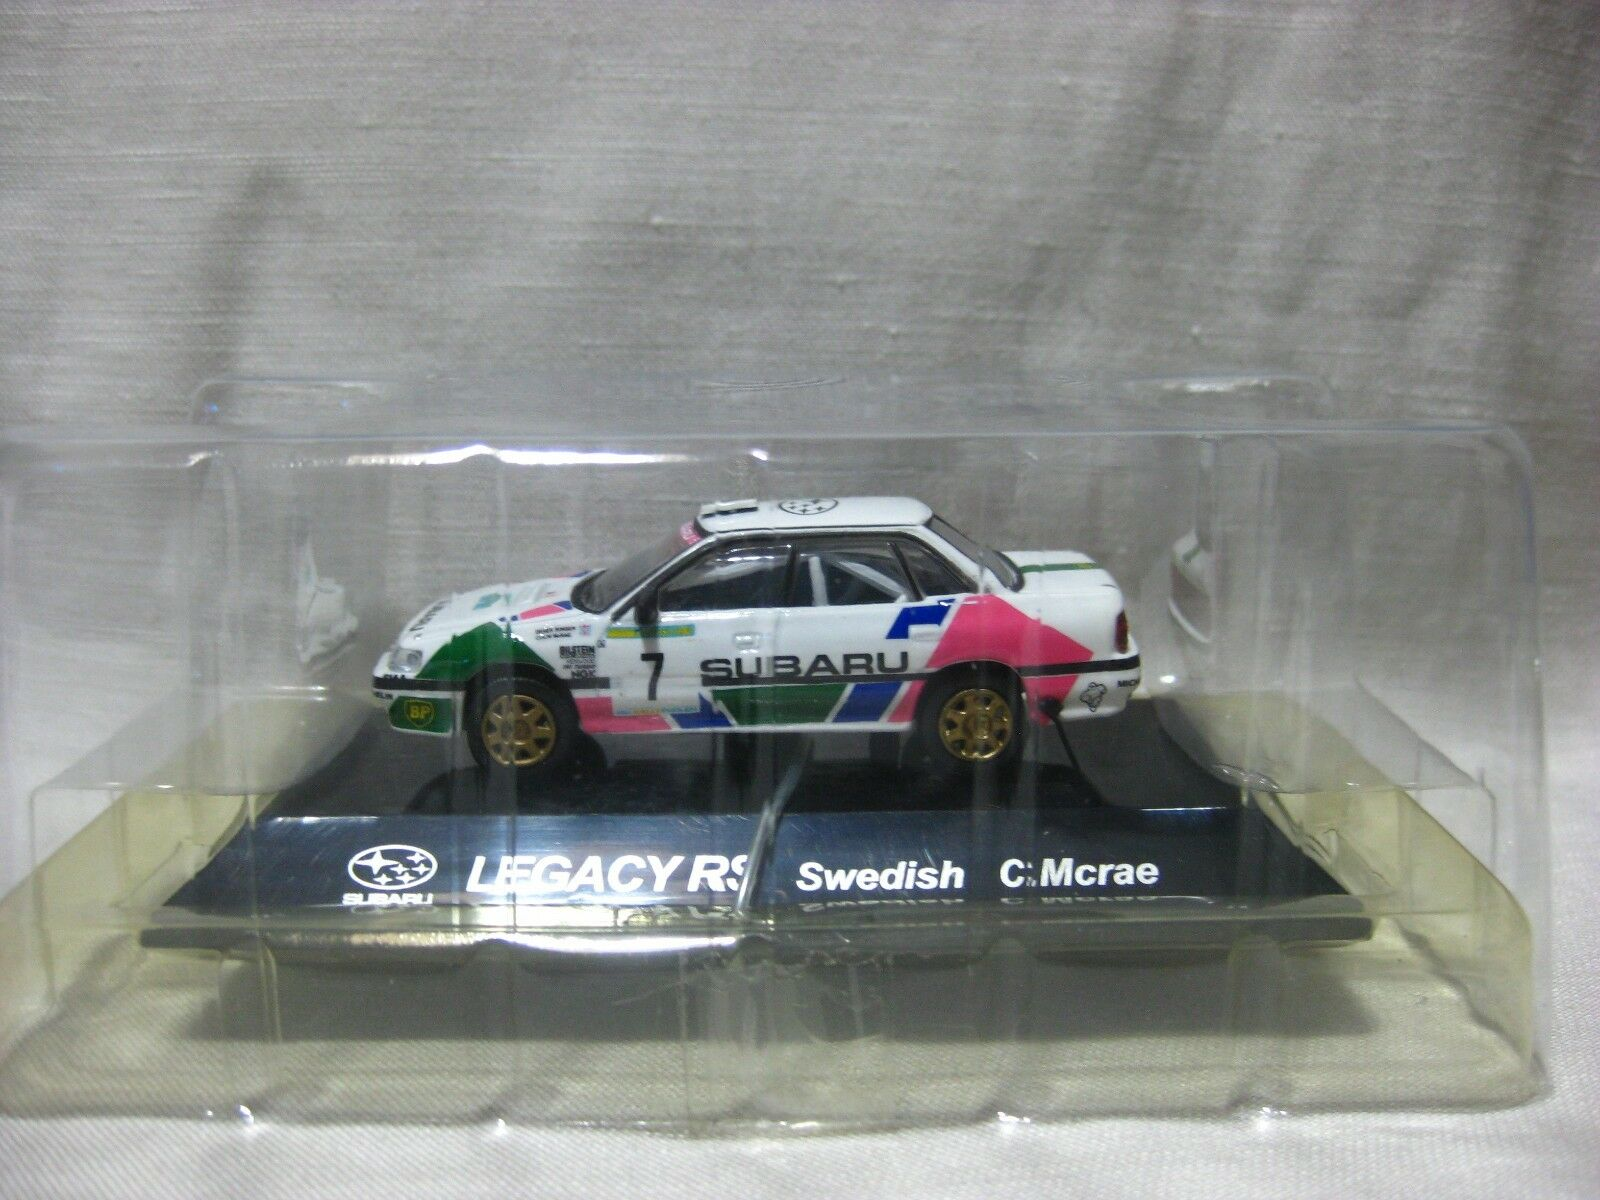 SUBARU LEGACY RS Swedish C.Mcrae 1 64 Scale CM's Rally Car Collection